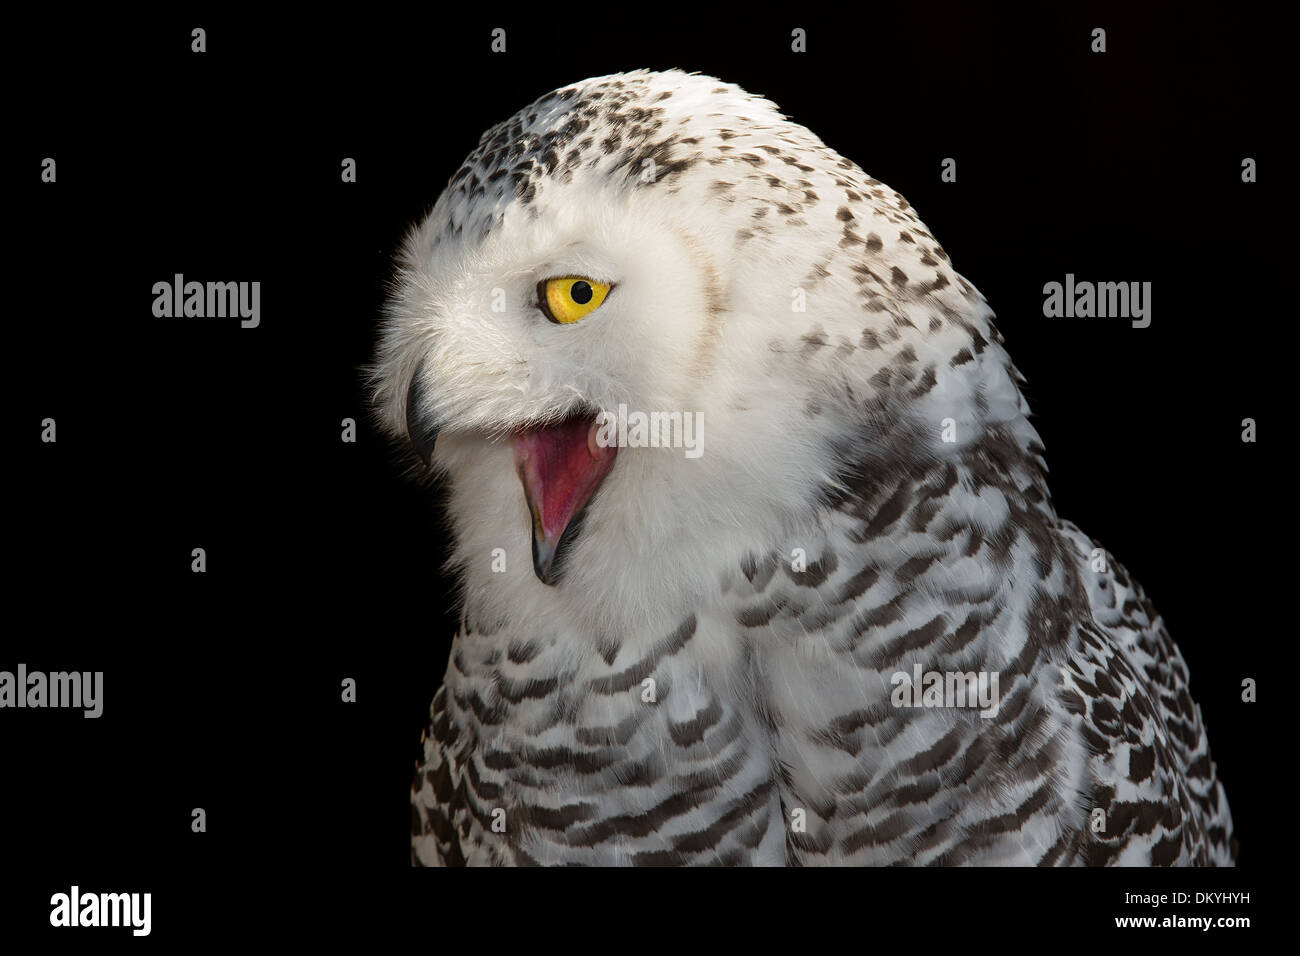 Screeching Owl Stock Photos & Screeching Owl Stock Images